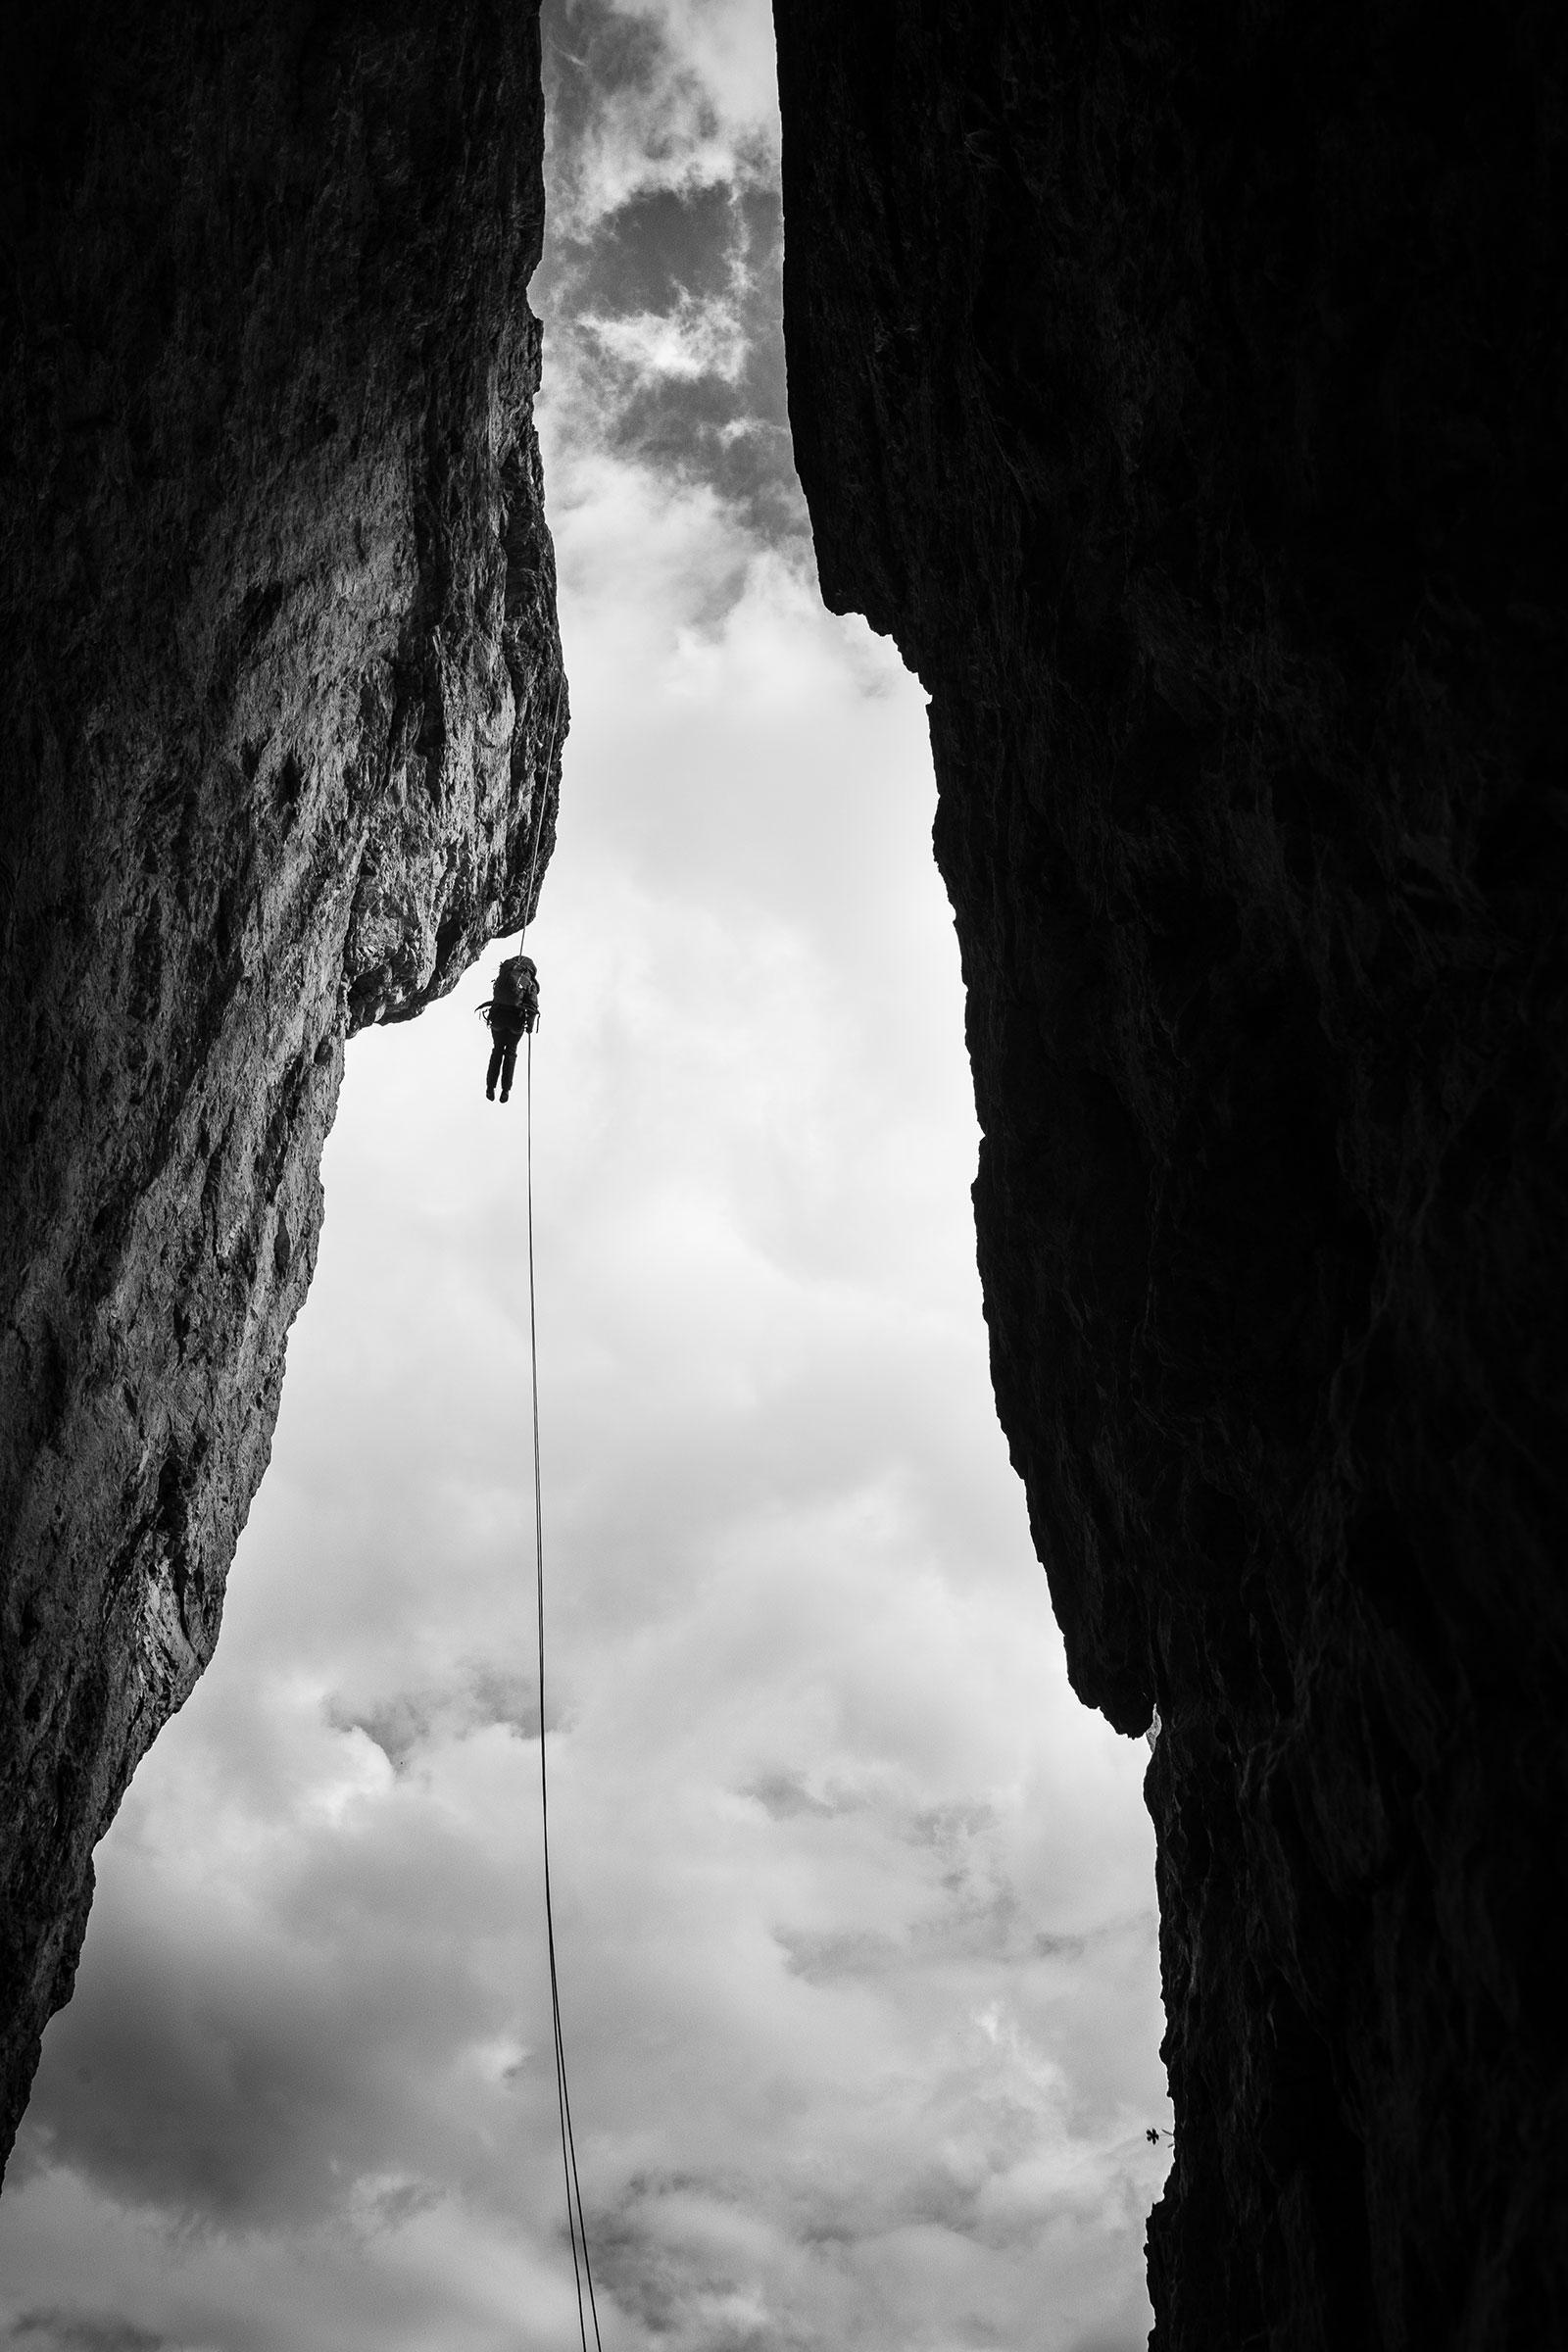 Abwärts. Klettern in den Dolomiten | Pauli Trenkwalder, Berge & Psychologie